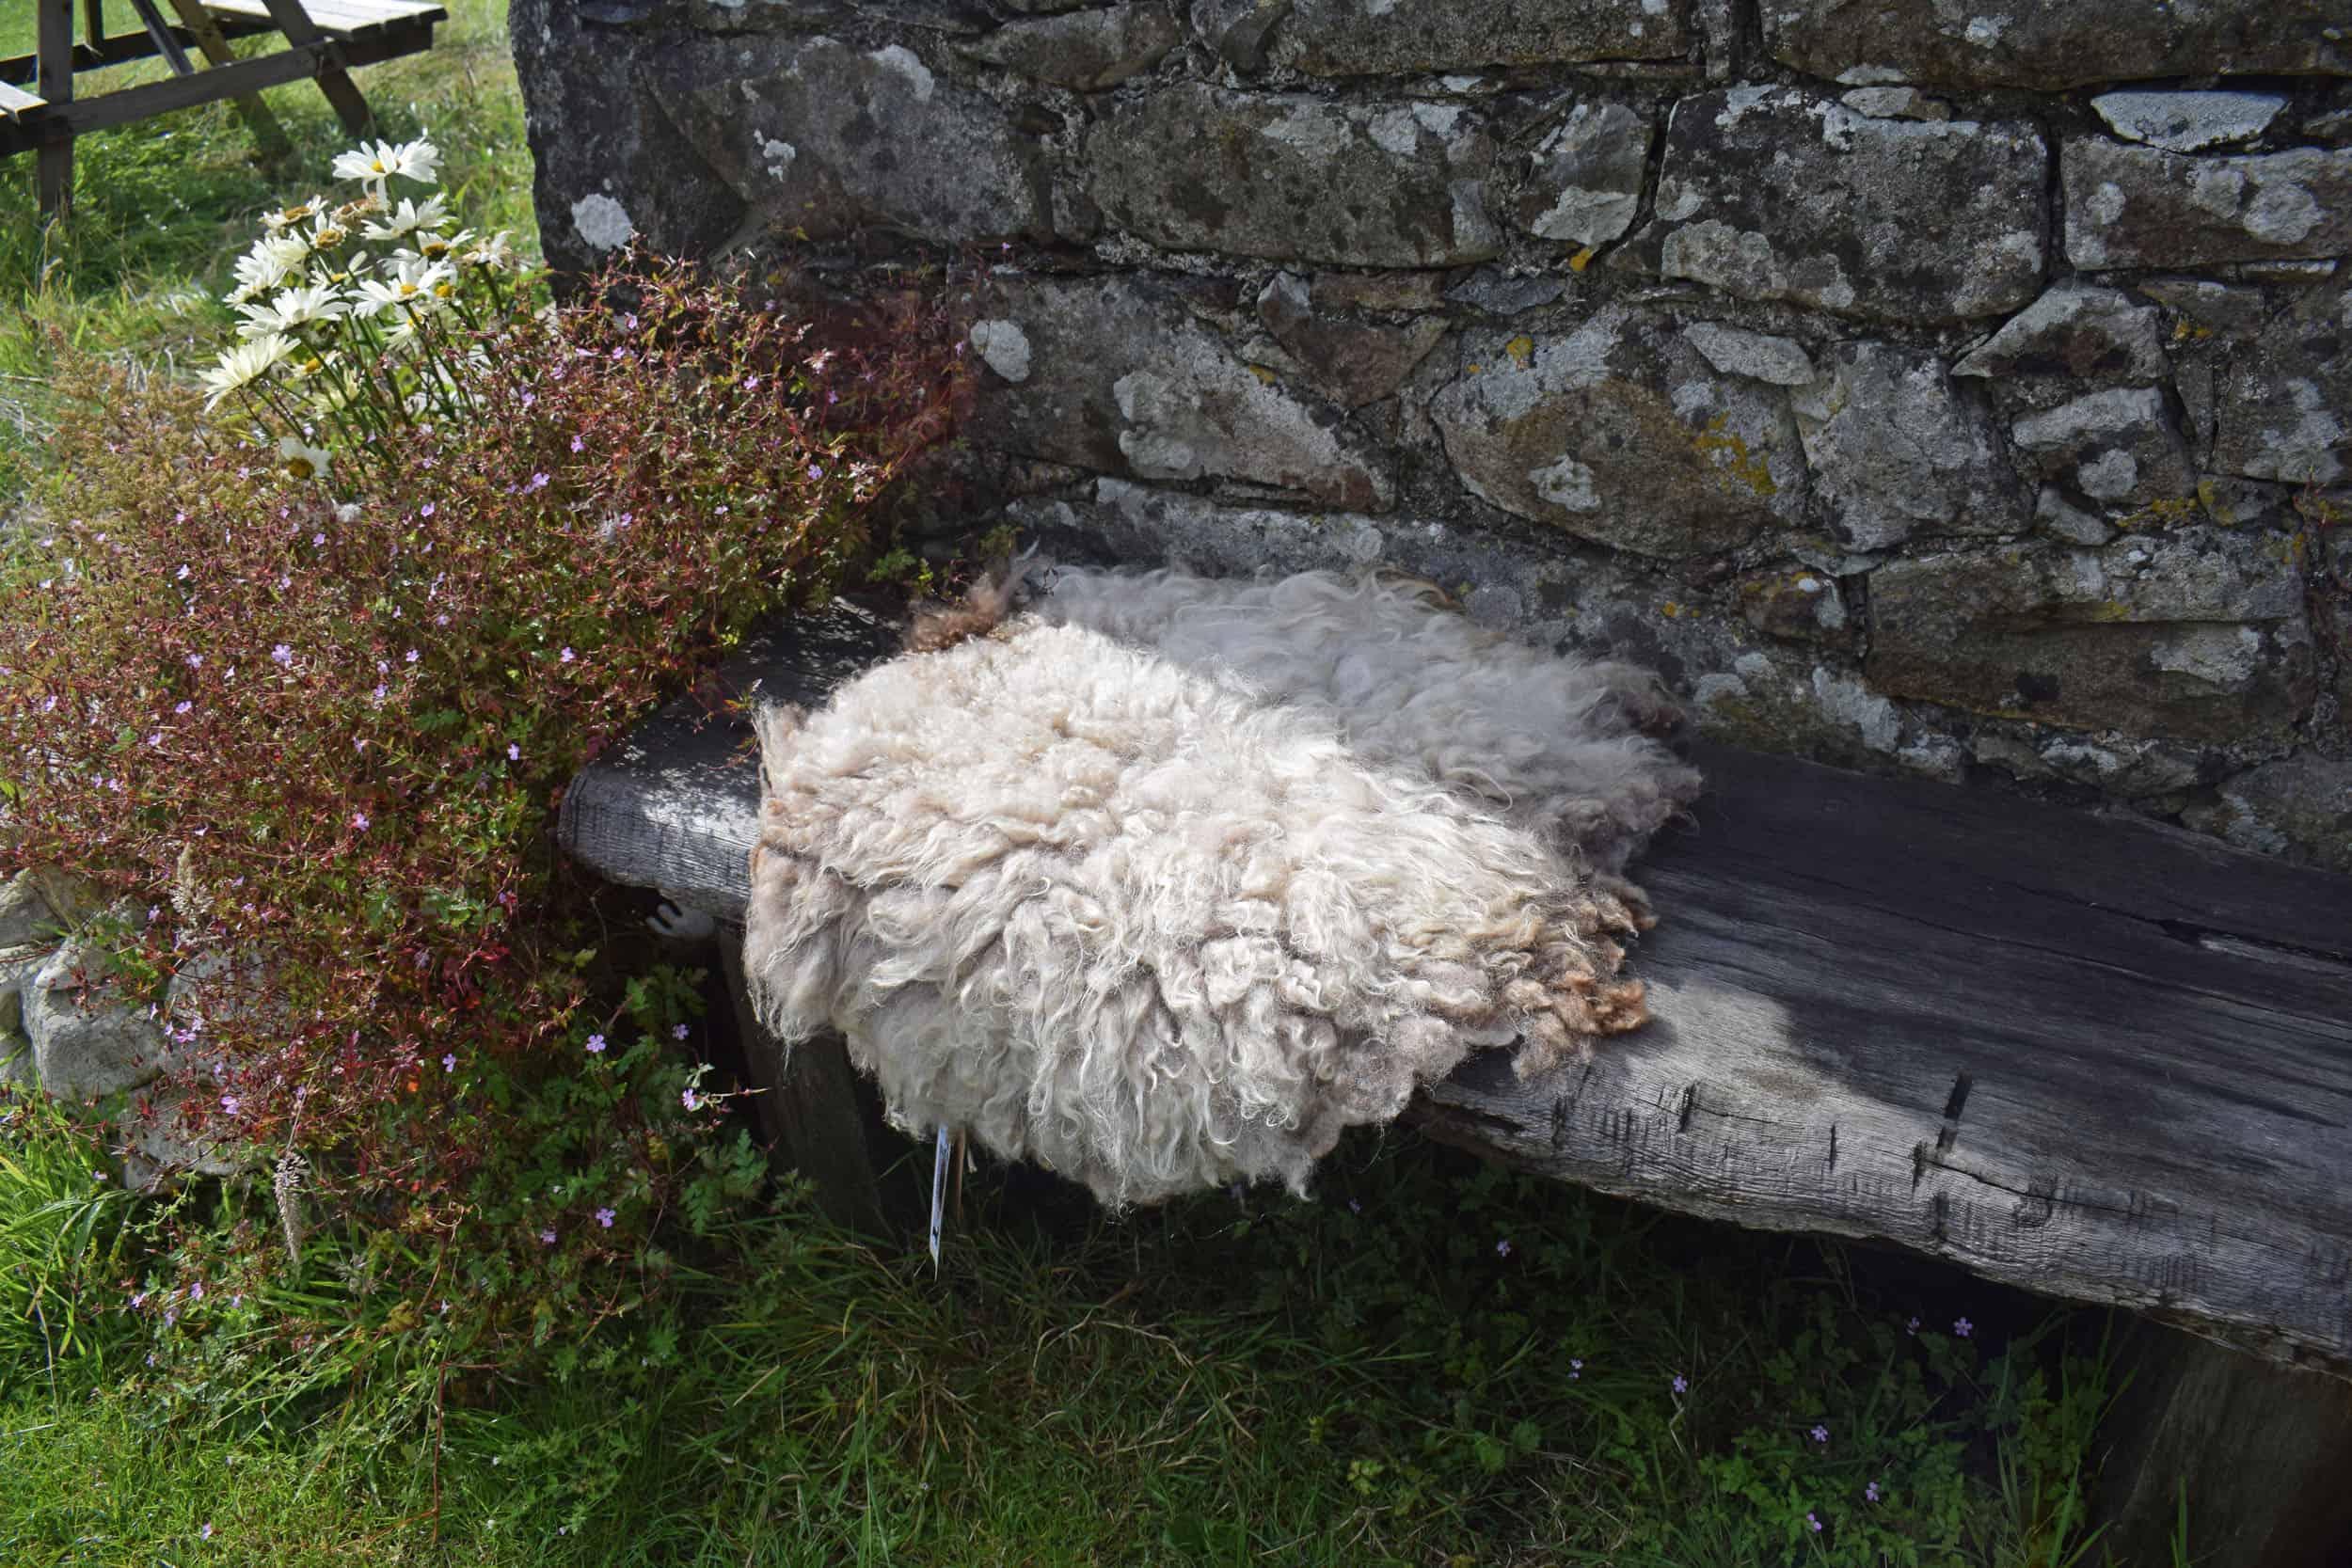 Felted fleece vegetarian sheepskin wool seat pad brown harriet ethical kind fiber 2